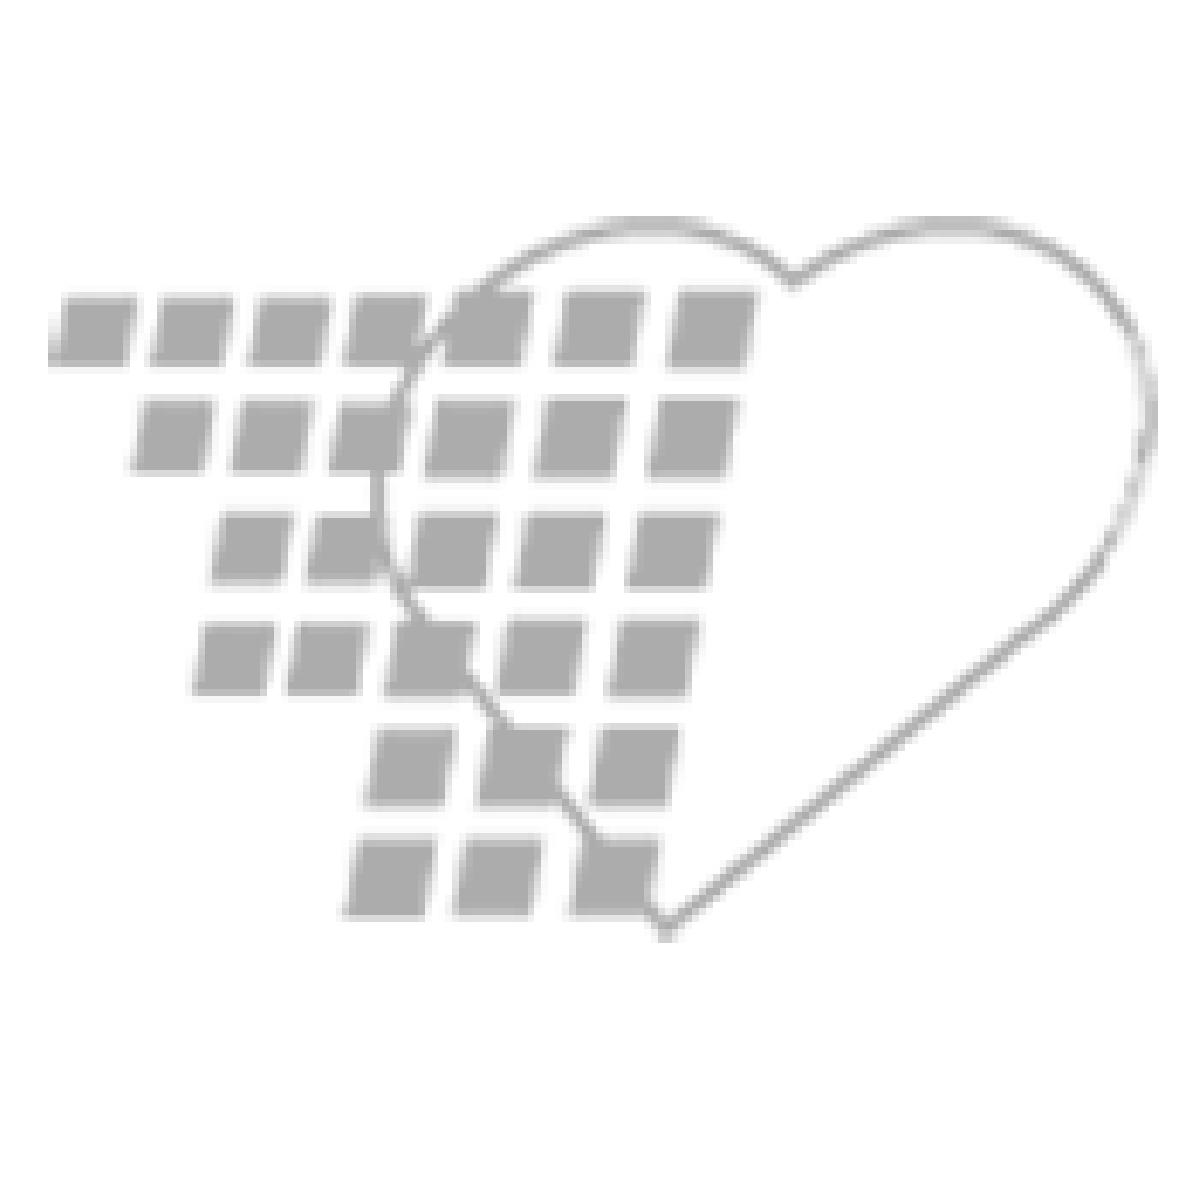 05-74-7887 Dental Mirror Sterile Plastic